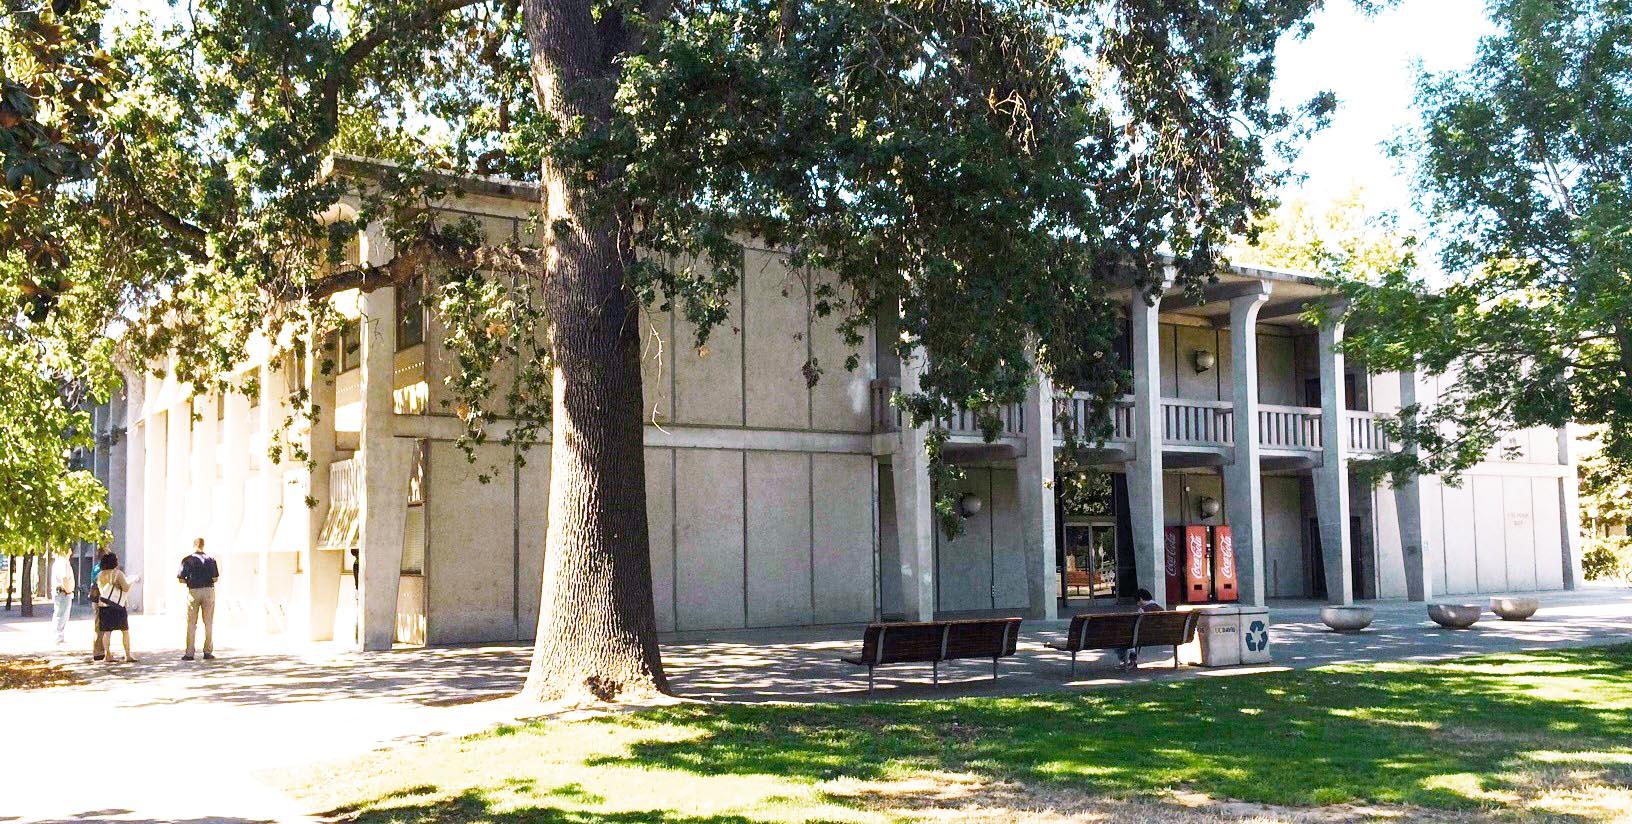 University of California, Davis, Olson Hall